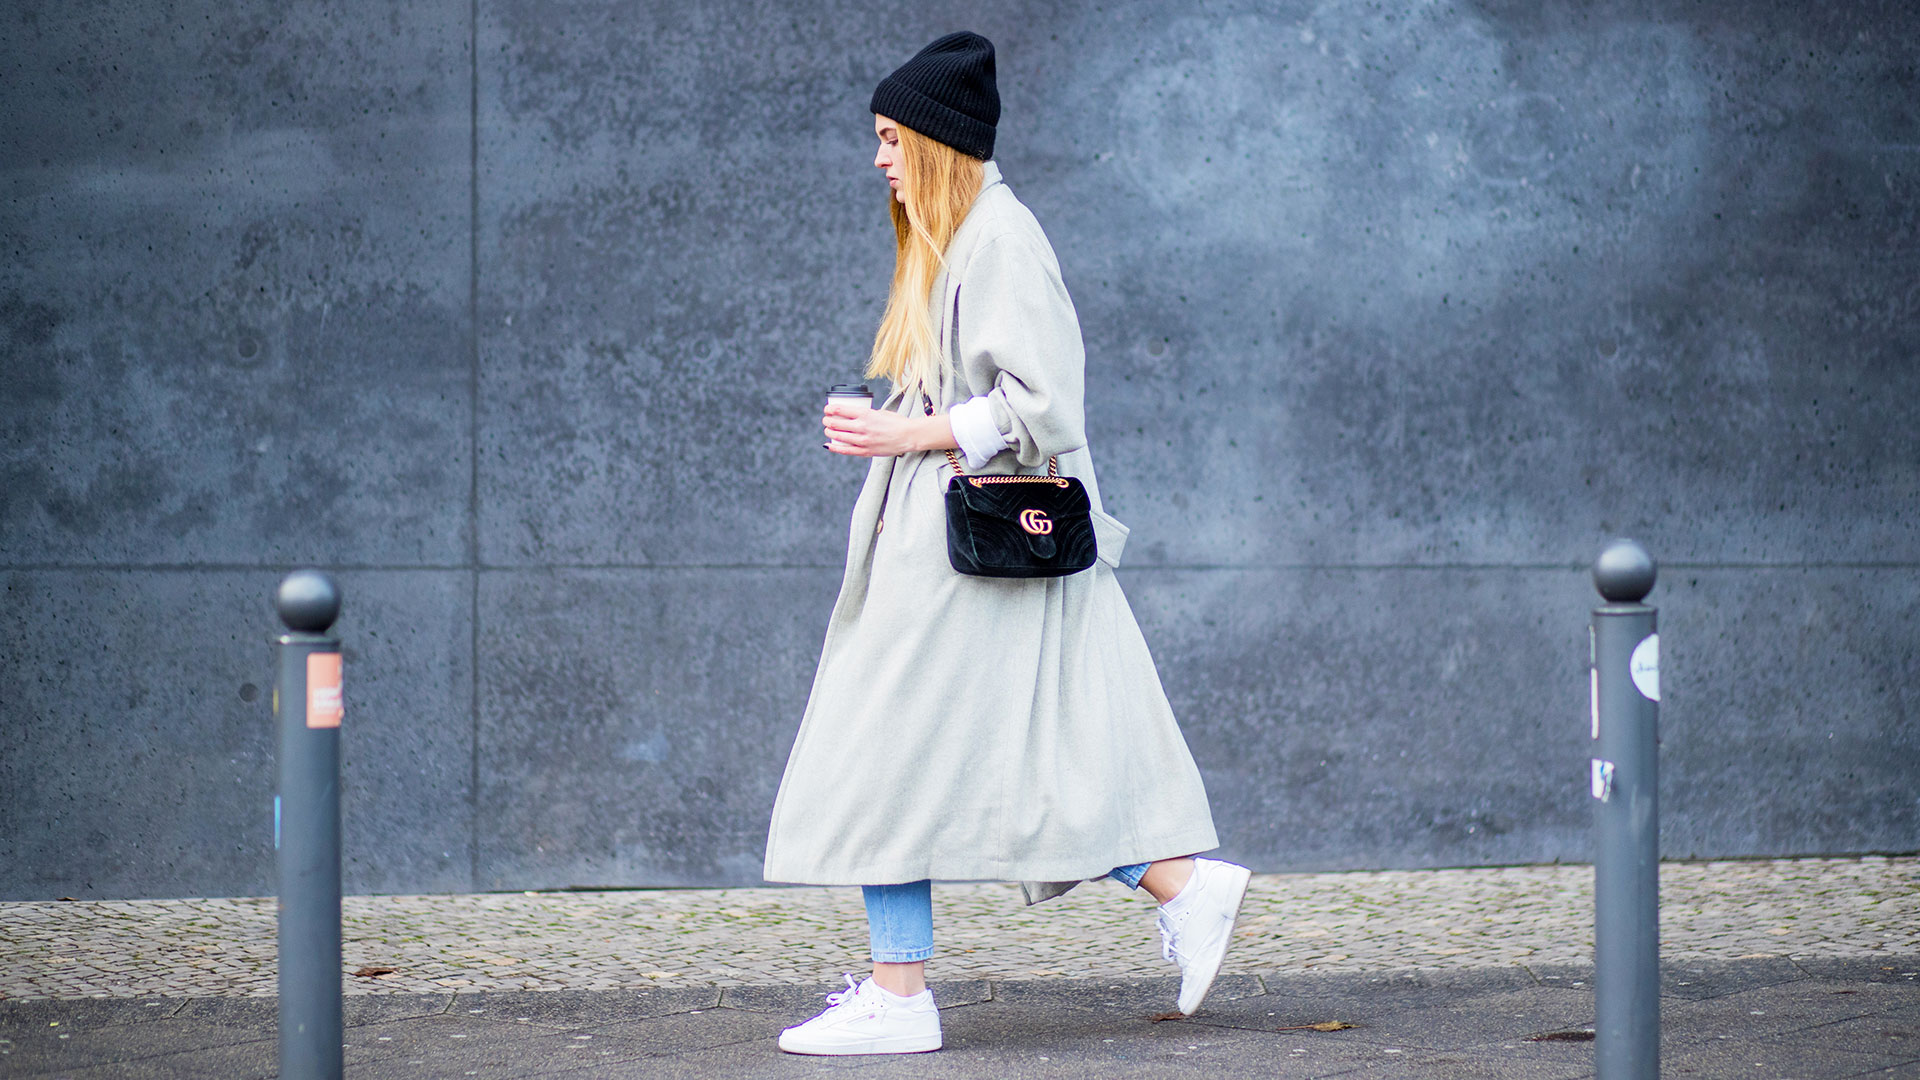 Stylish Woman Walking with Coffee